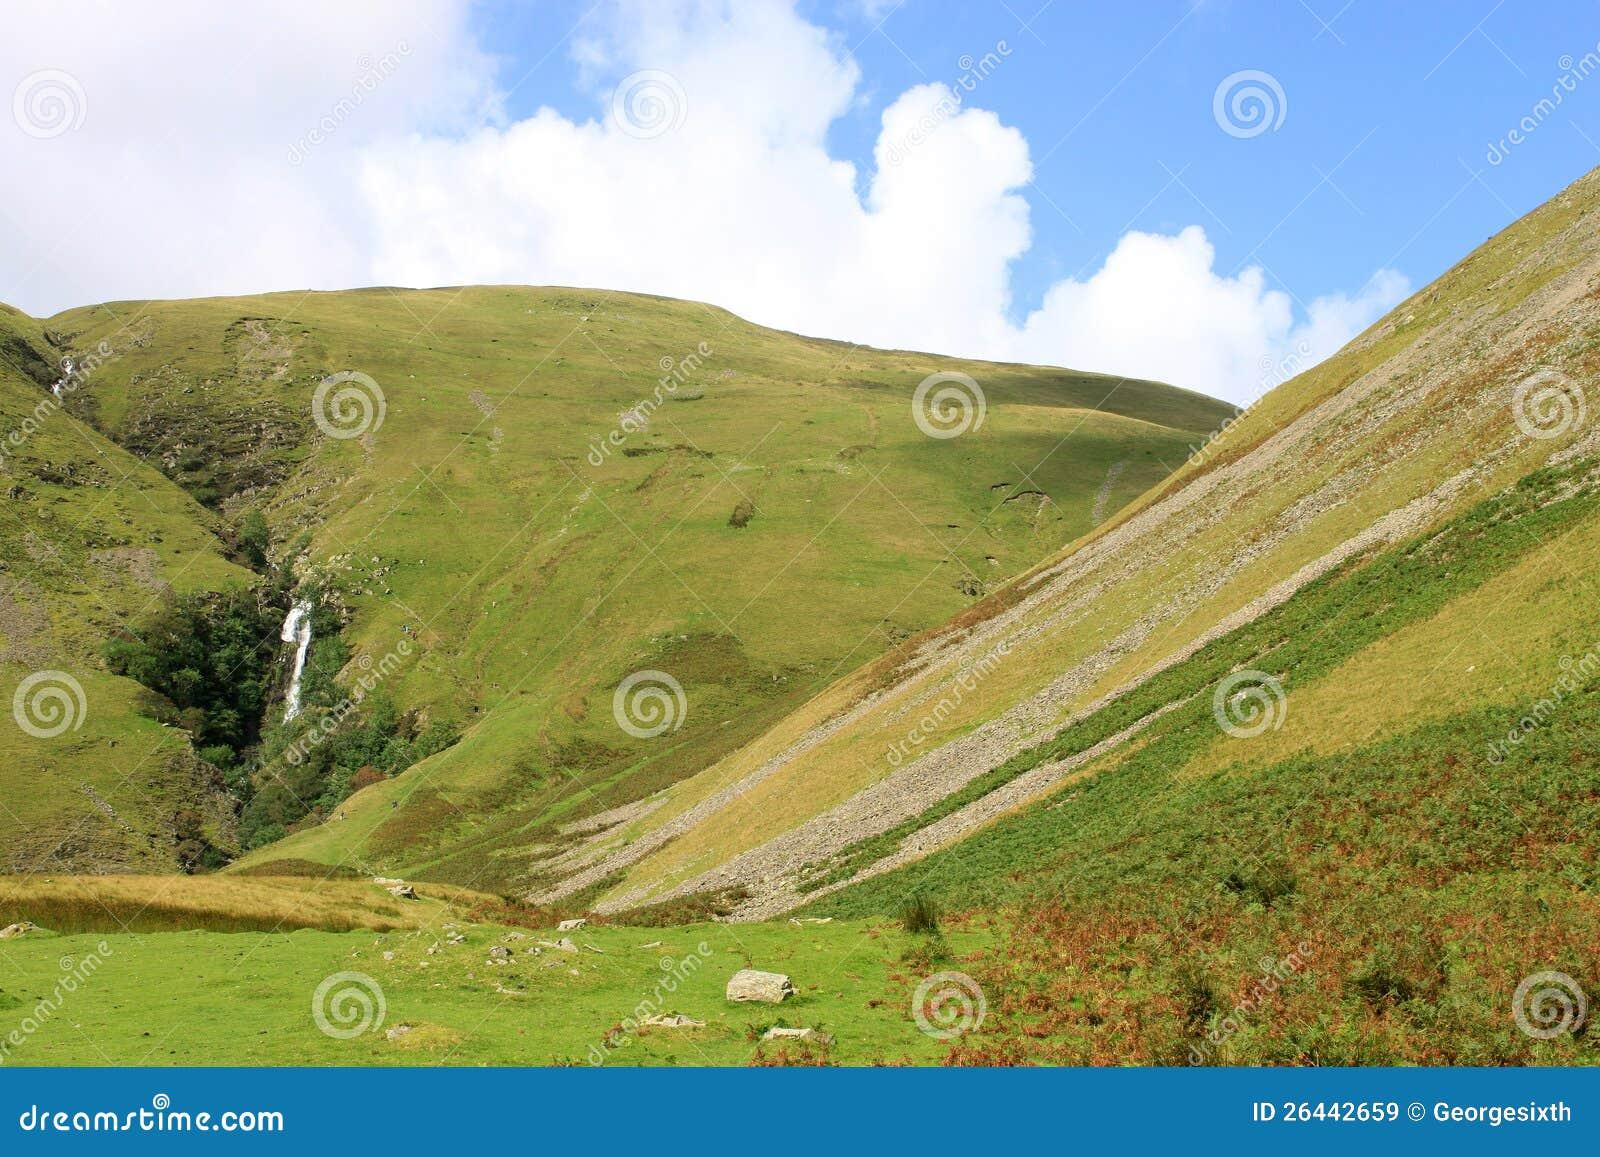 Sedbergh United Kingdom  city images : Cautley Spout waterfall near Sedbergh in Cumbria, United Kingdom ...